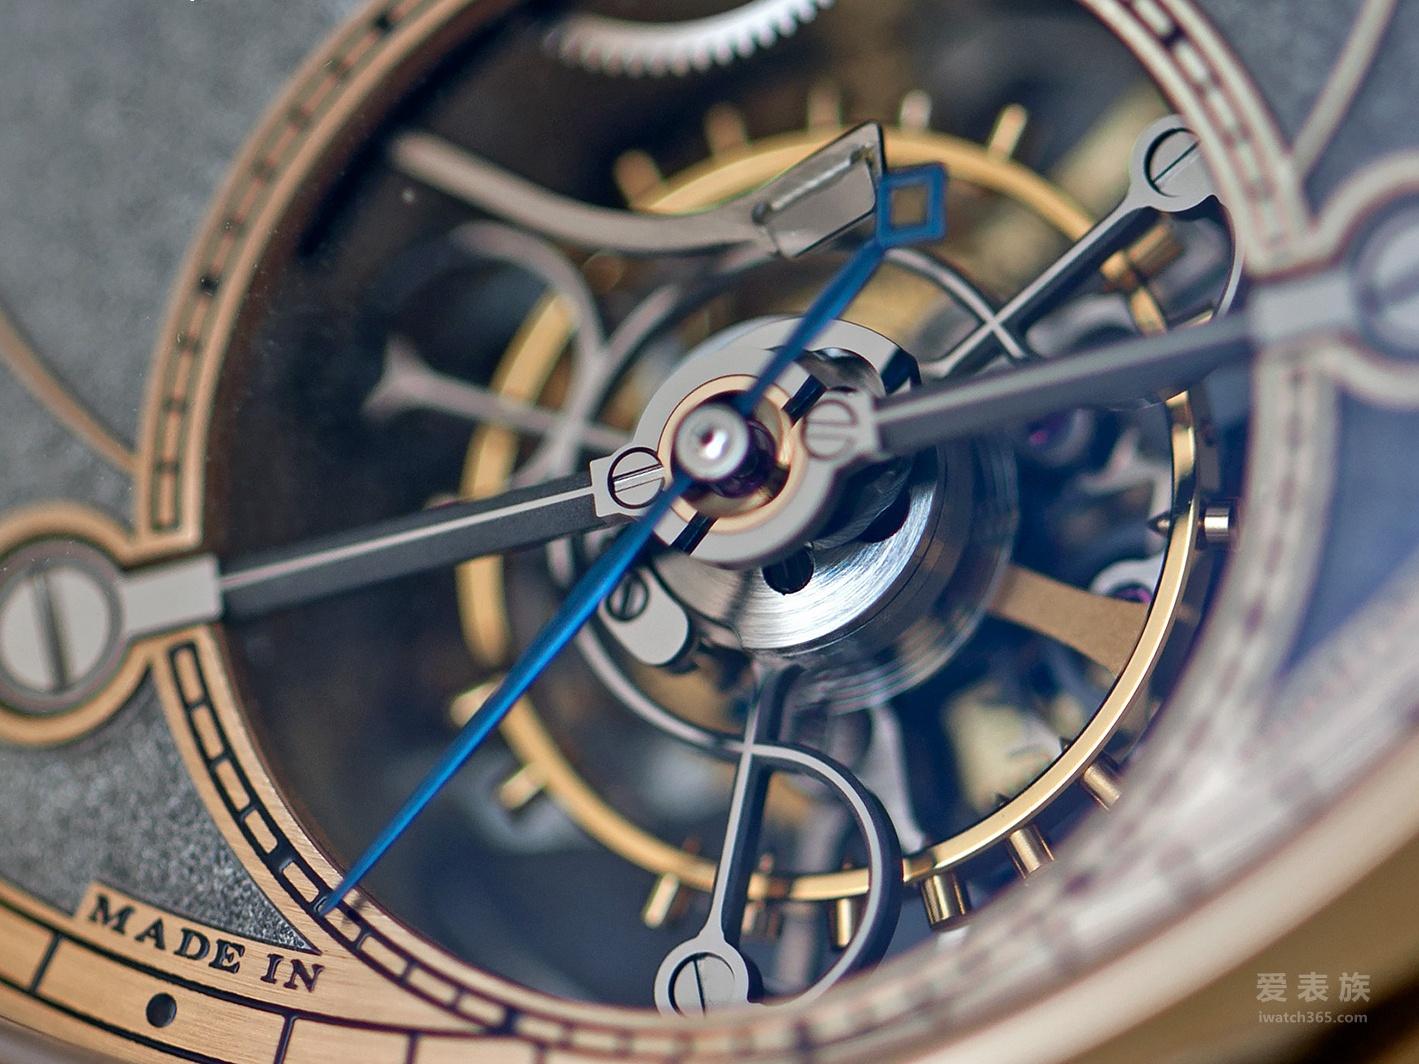 朗格200周年收官之作---1815 Tourbillon Handwerkskunst 手工雕刻陀飞轮腕表